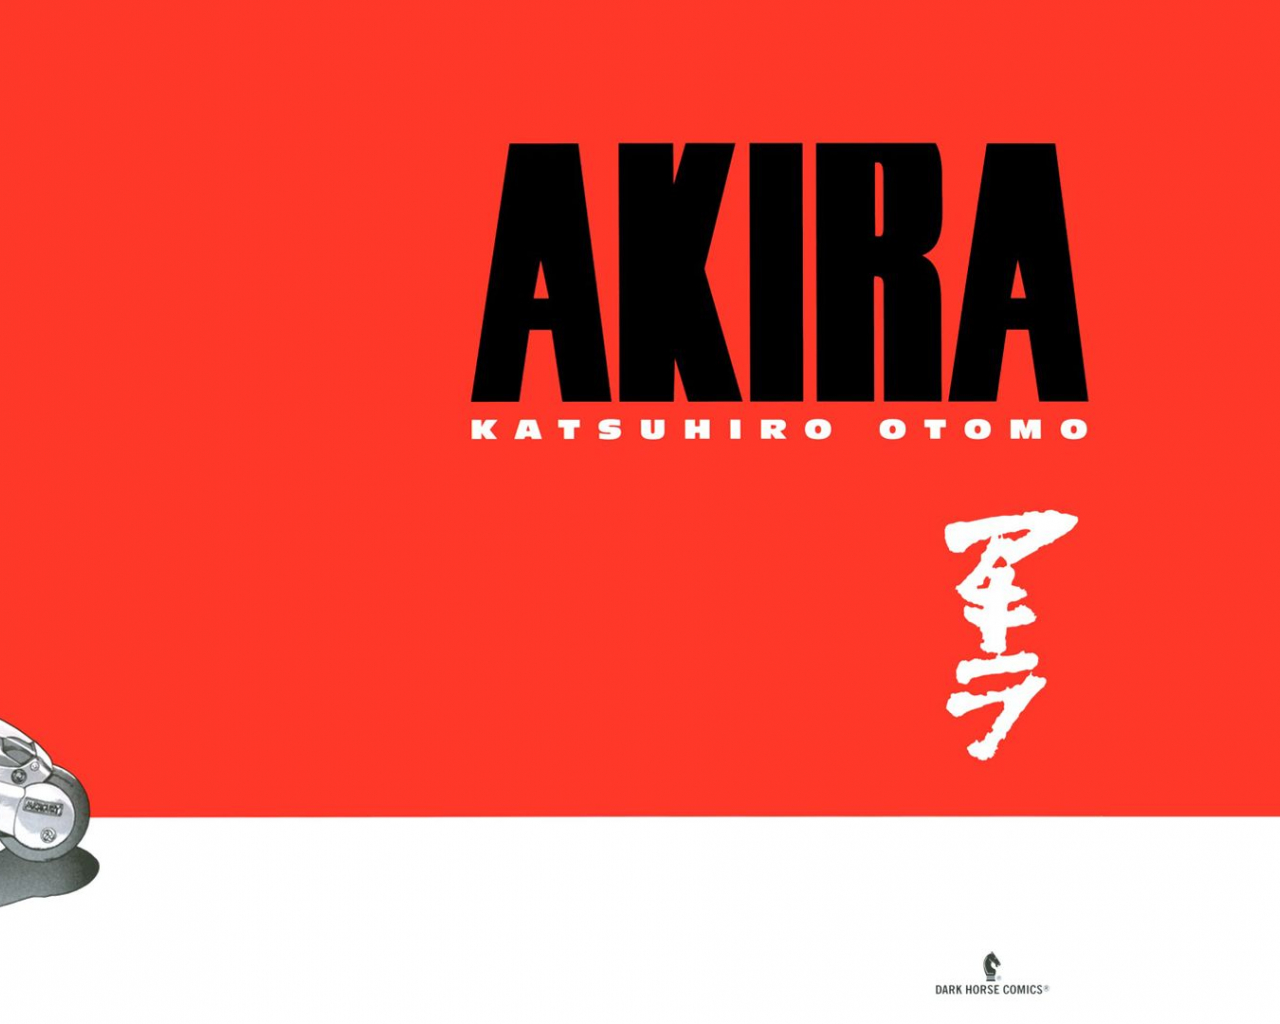 Free Download Akira Wallpaper Hd 1920x1080 For Your Desktop Mobile Tablet Explore 76 Akira Wallpaper What Are Those Wallpaper